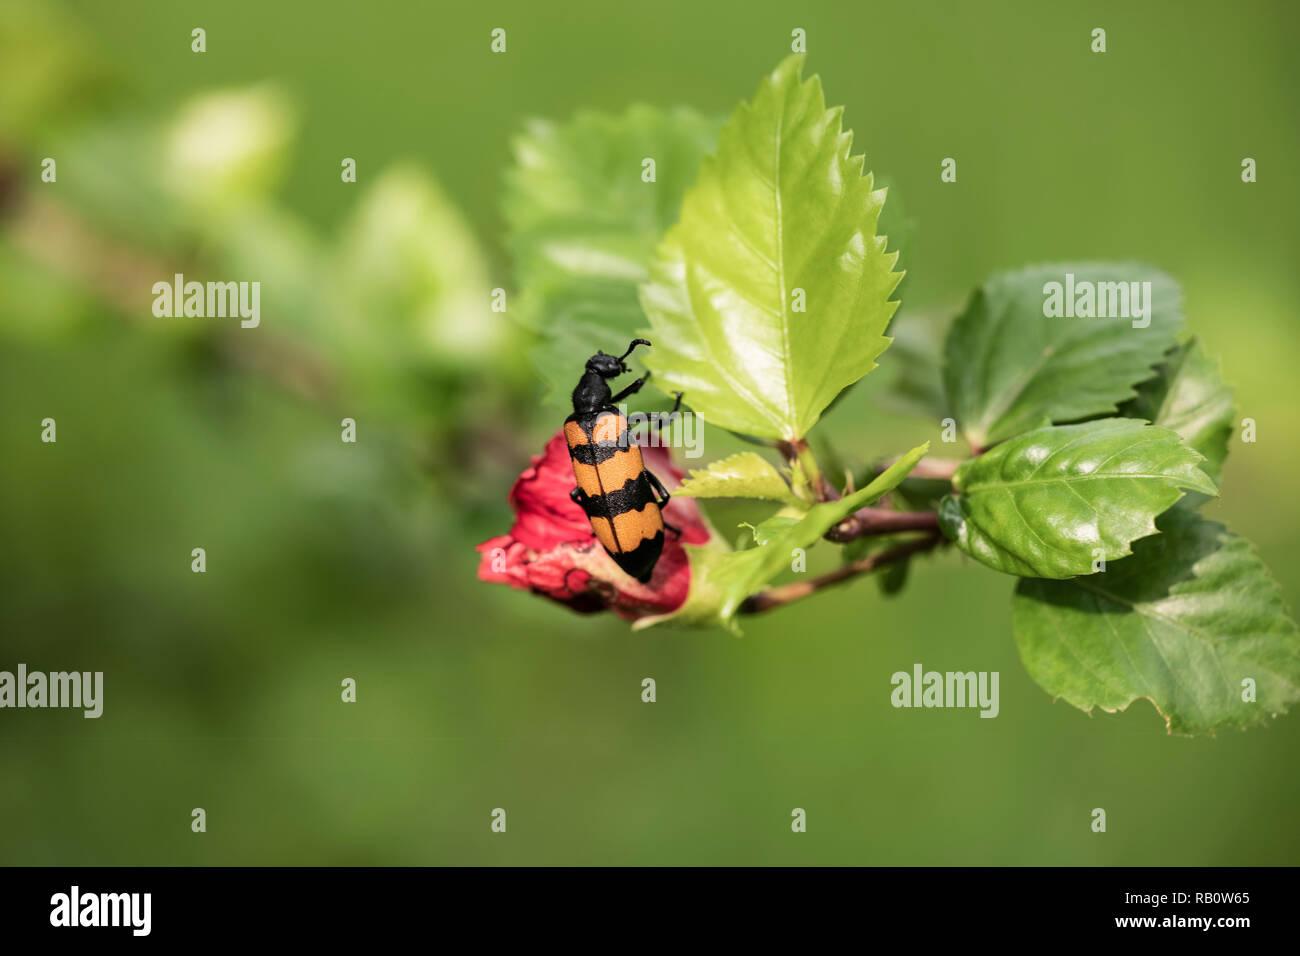 Hibiscus Beetle Stock Photos Hibiscus Beetle Stock Images Alamy